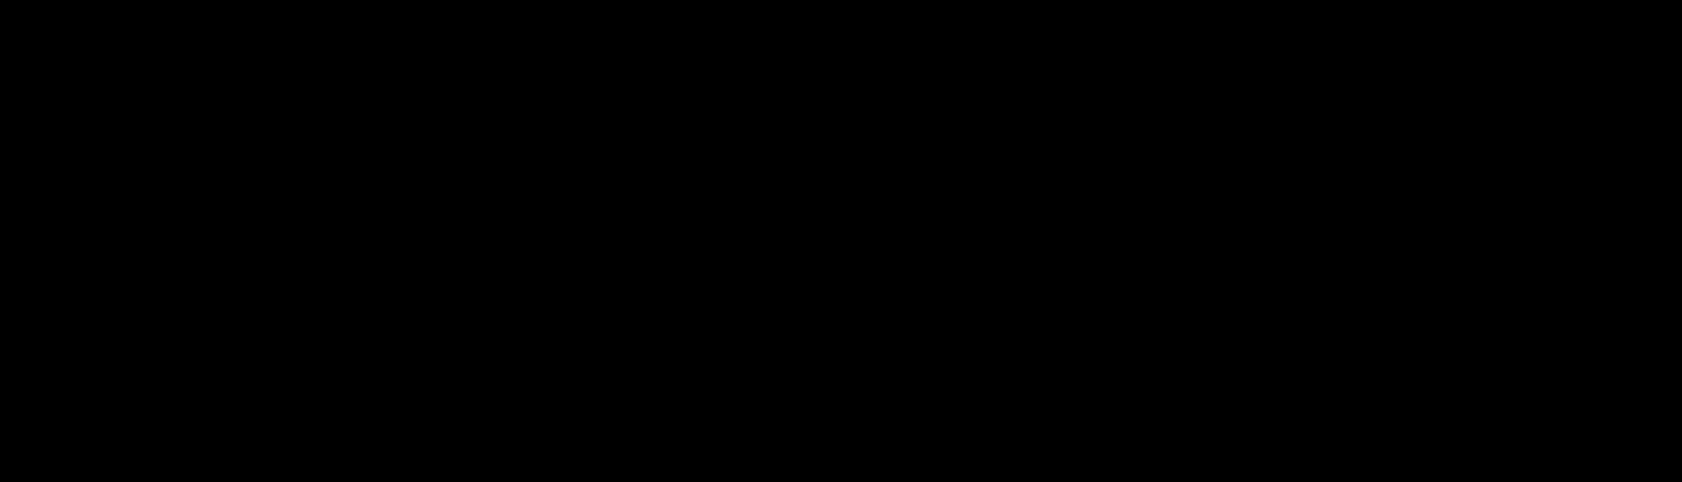 3-Benzyl-1,3-thiazol-3-ium Bromide